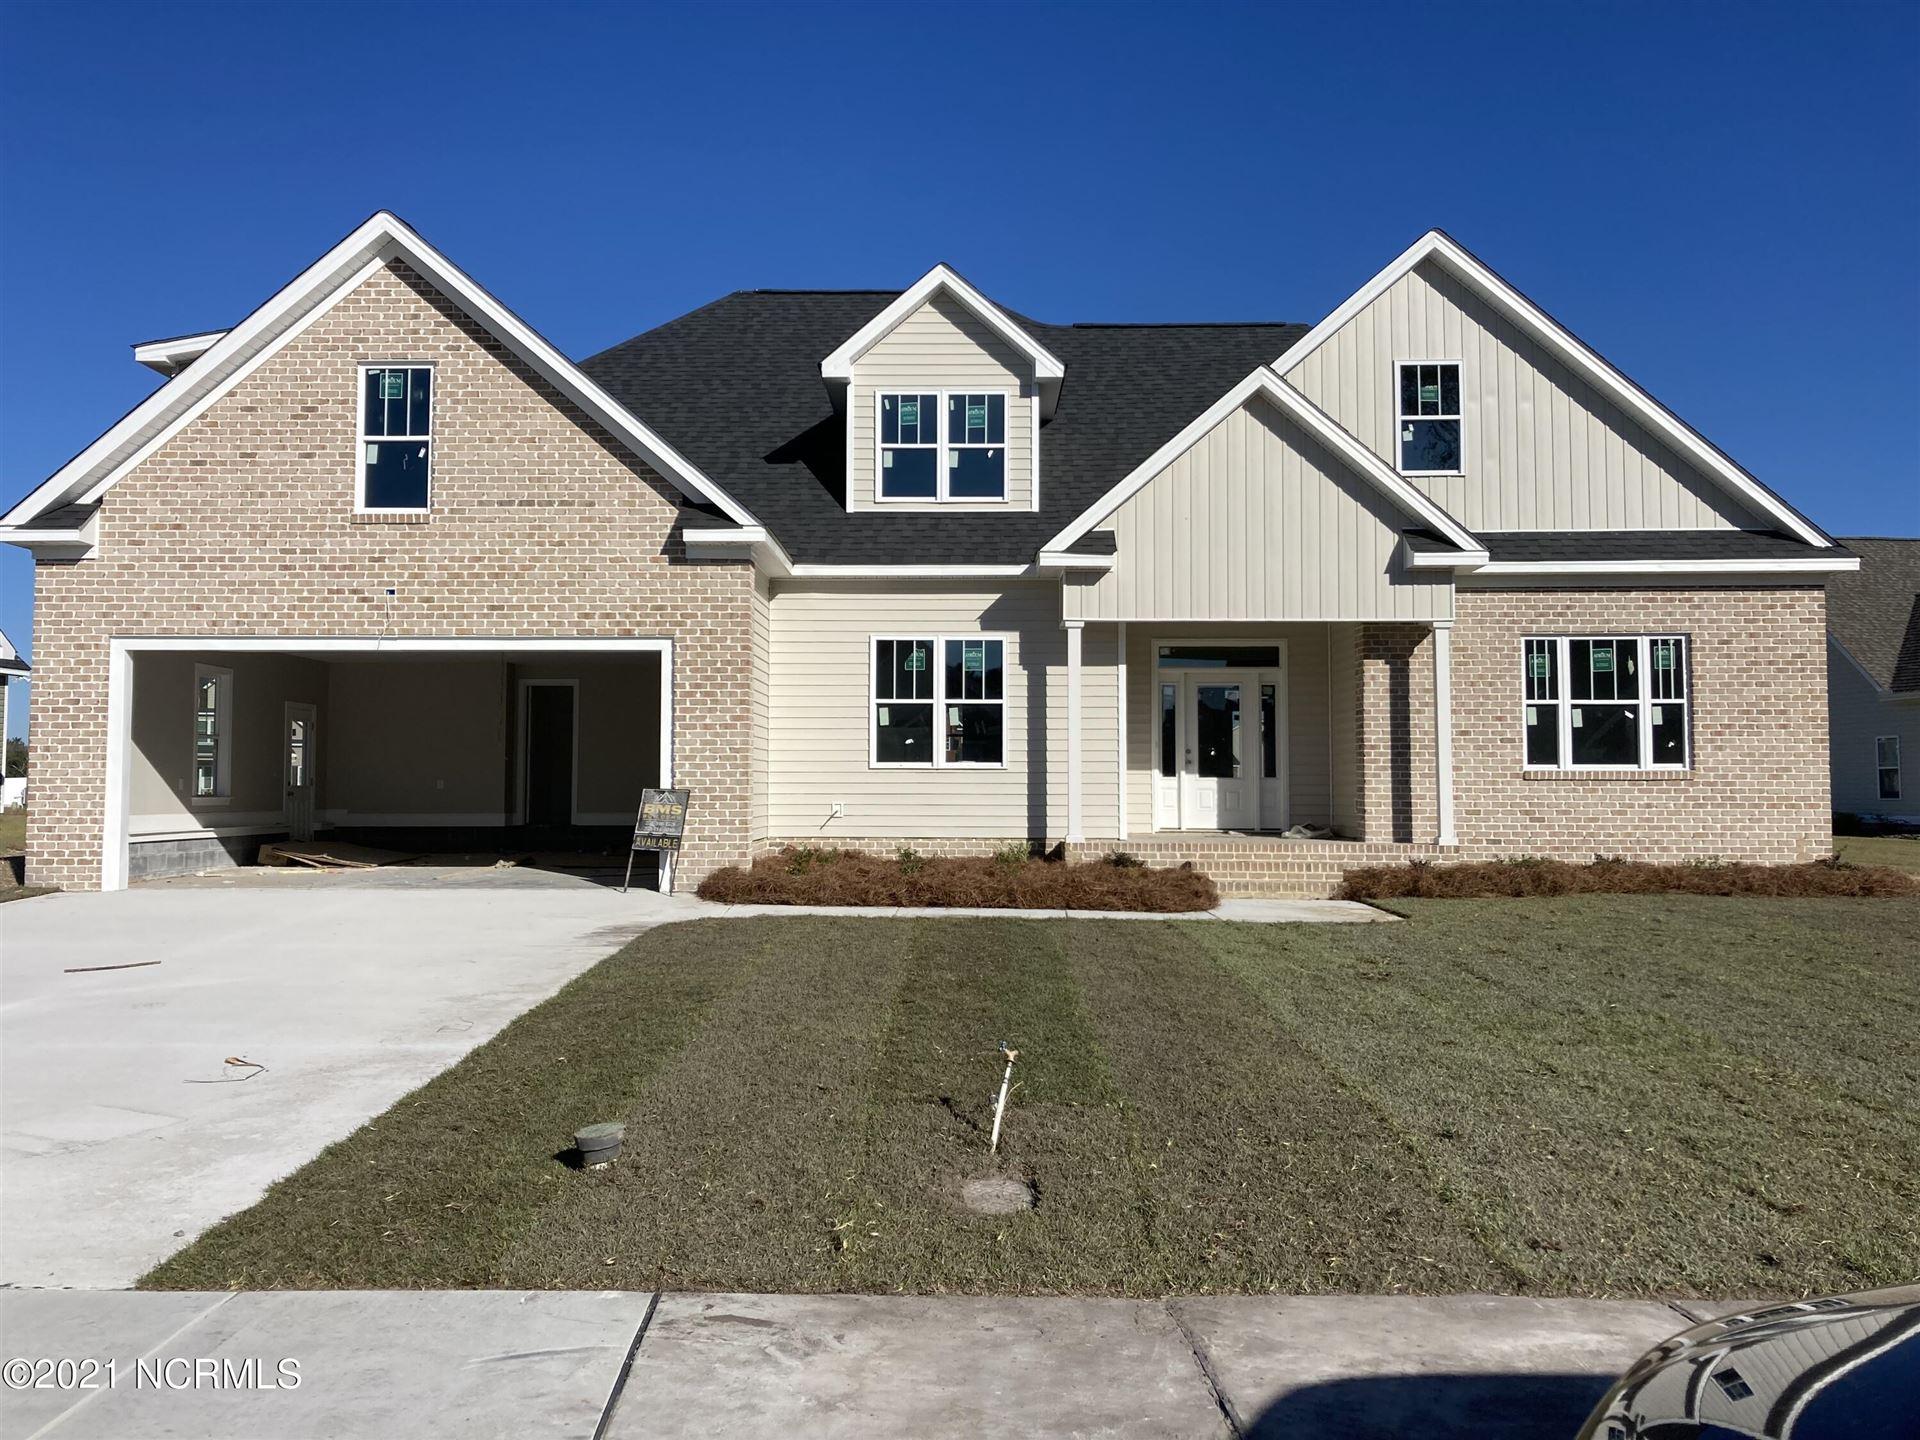 Photo of 3403 Brayden Court, Greenville, NC 27834 (MLS # 100296076)